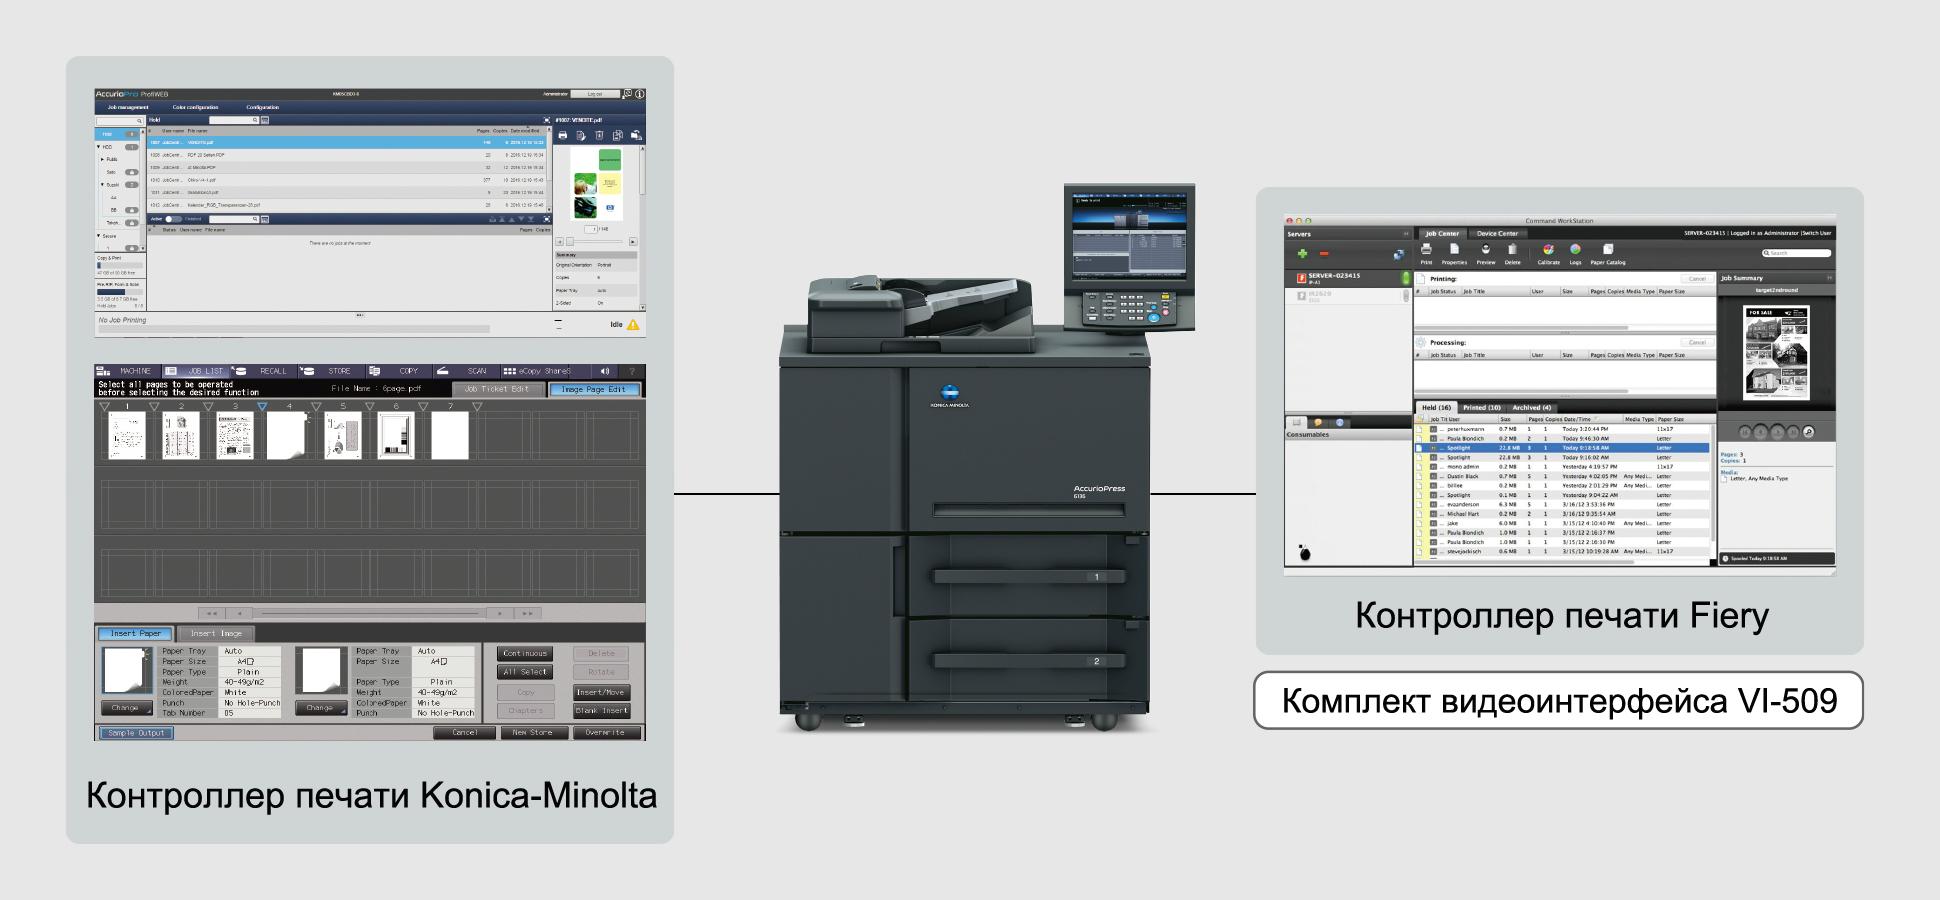 Konica Minolta AccurioPress 6136. Совместимость с контроллером EFI